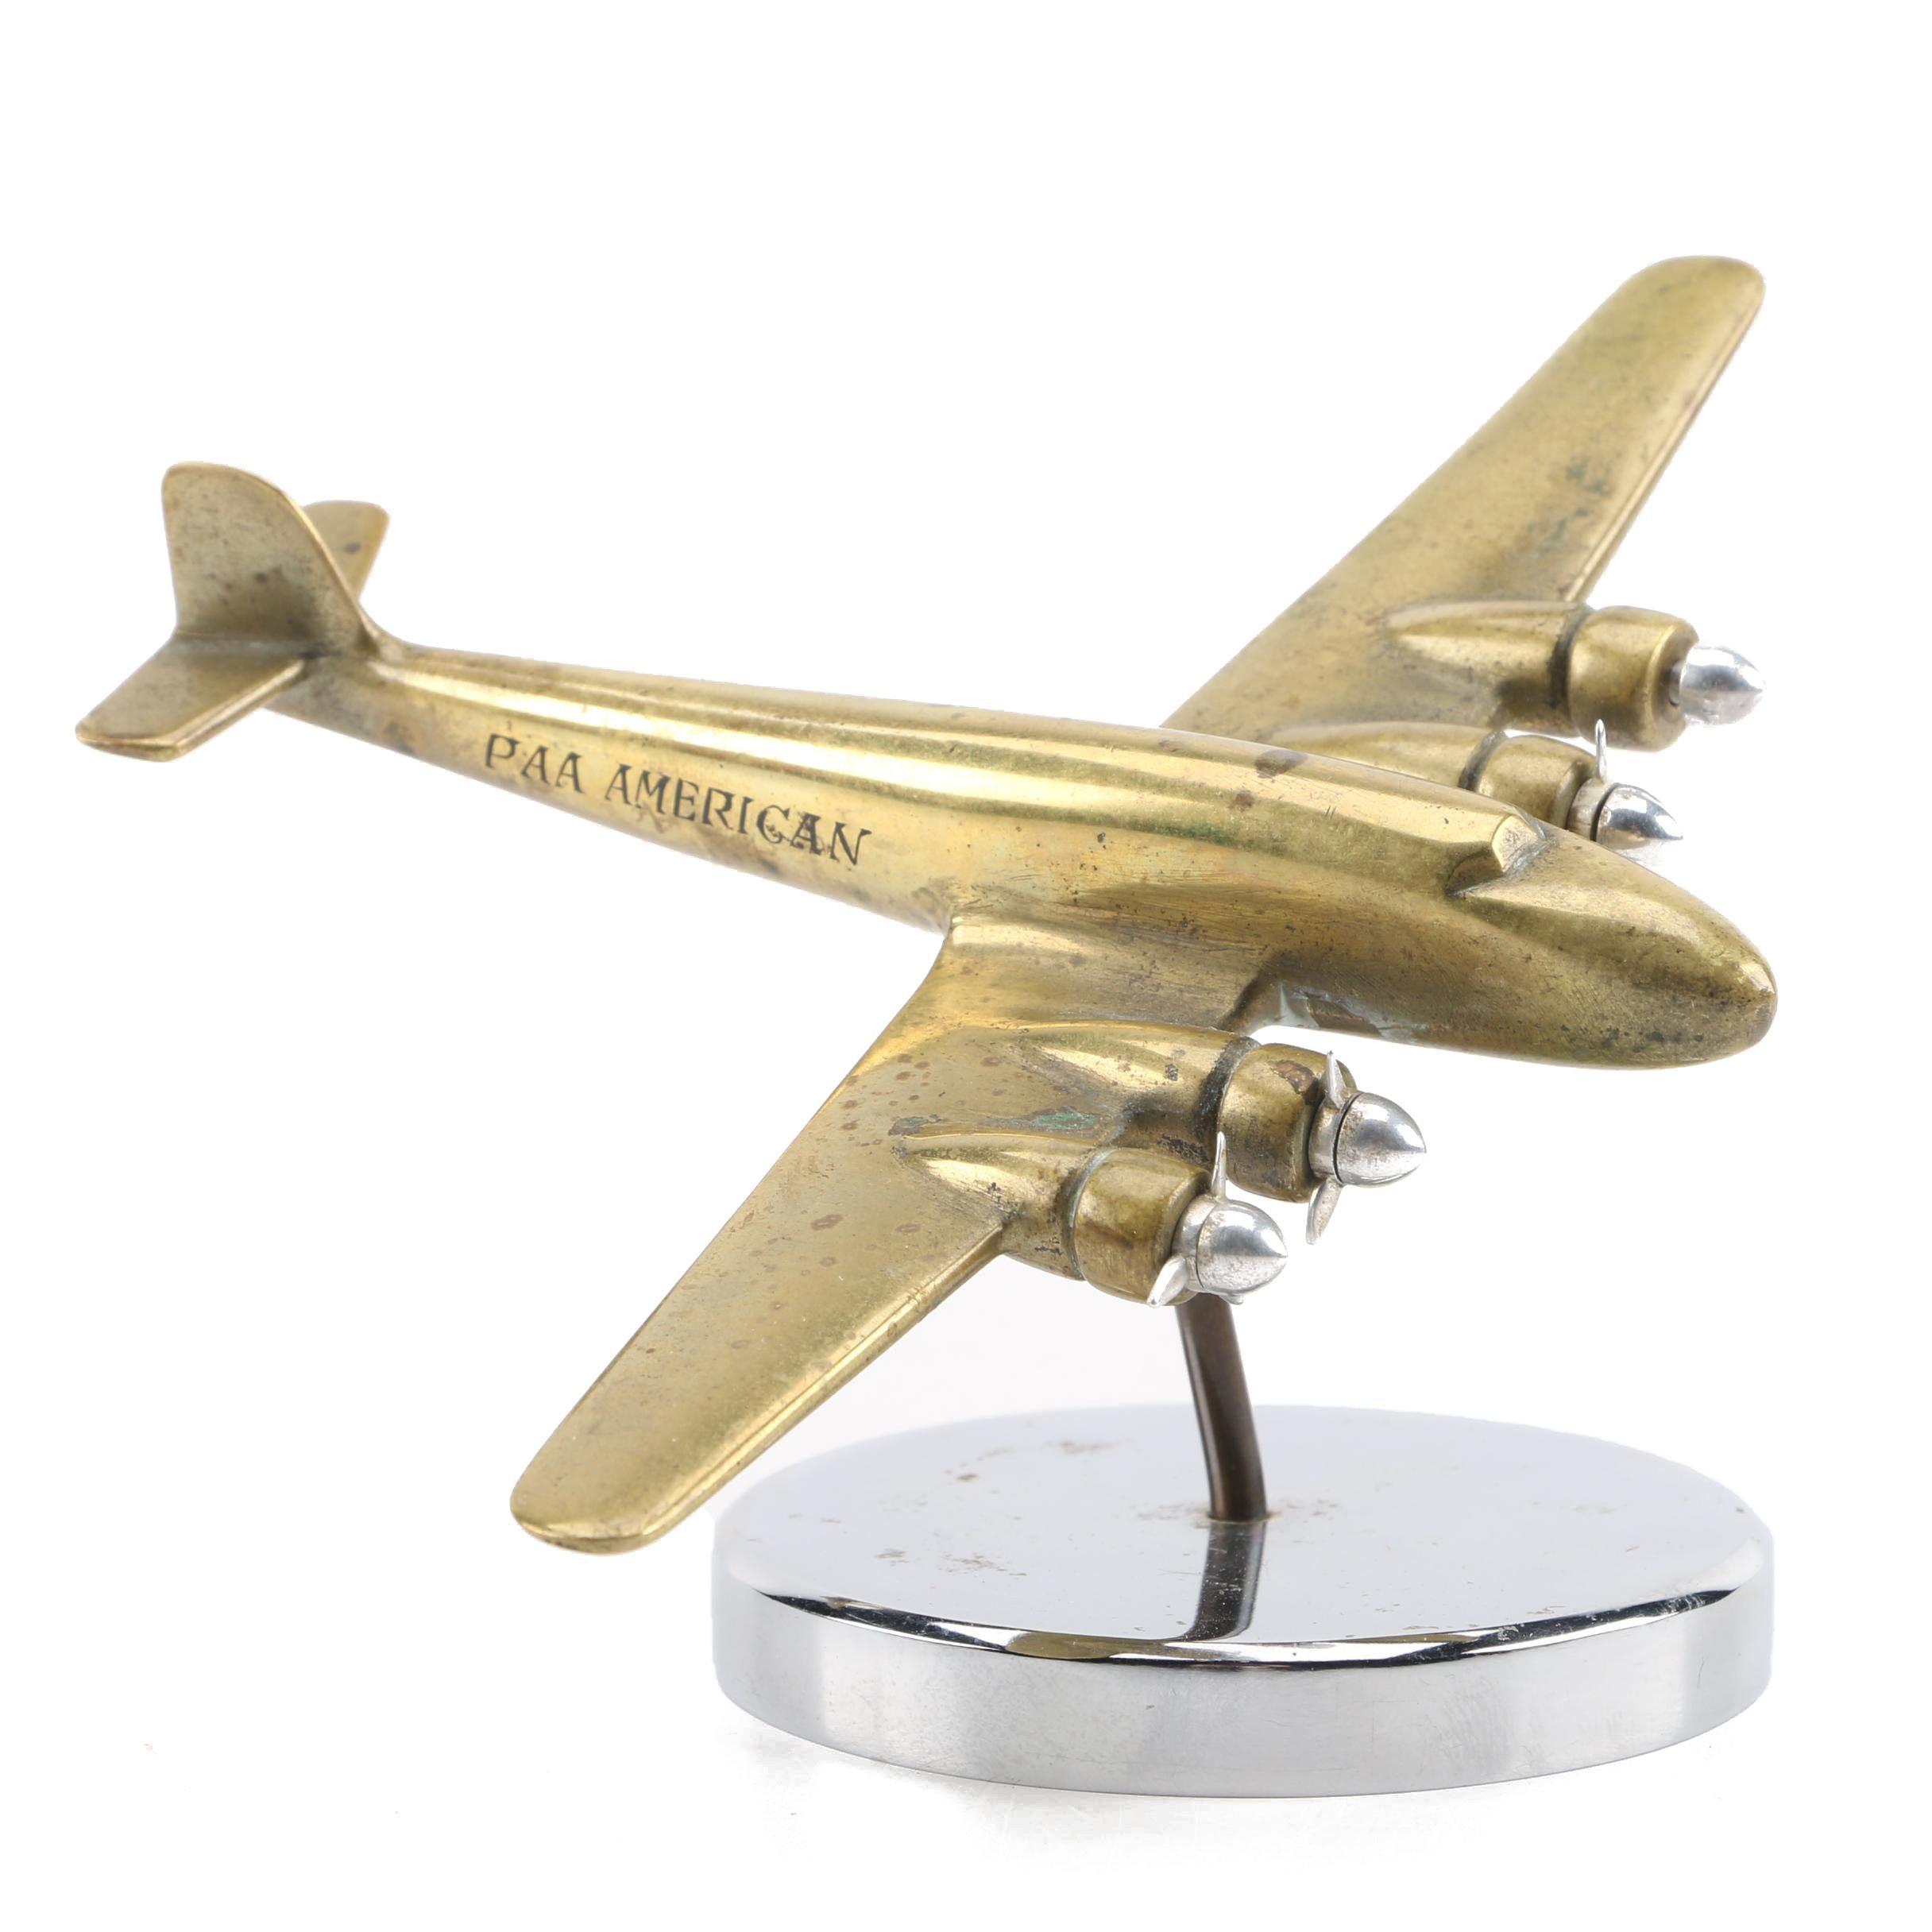 Vintage Pan American Model Airplane on Stand